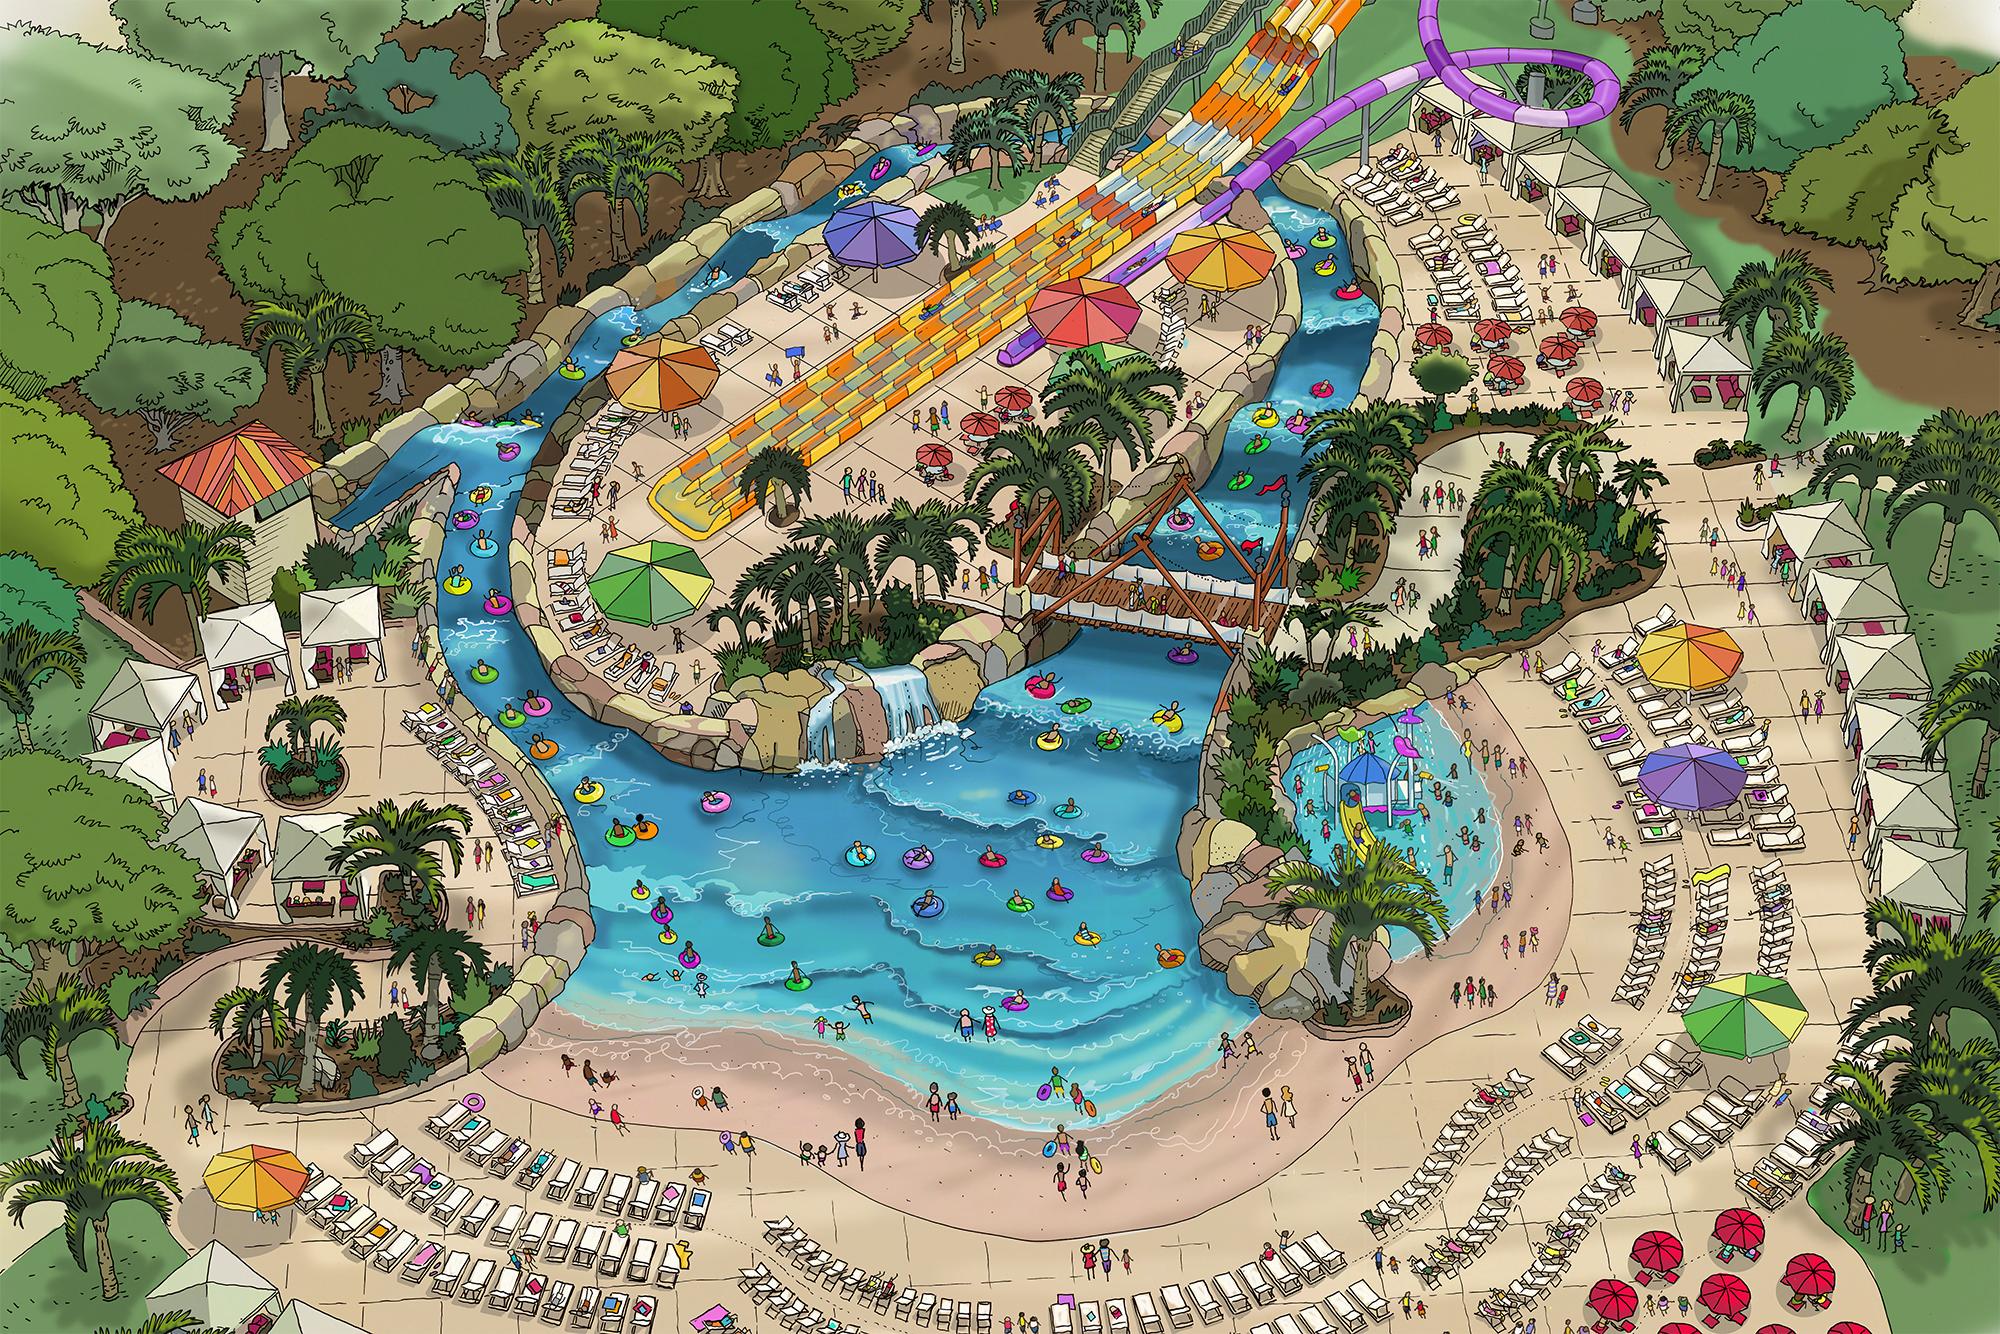 Wave Pool Designs | ADG's Tidal River